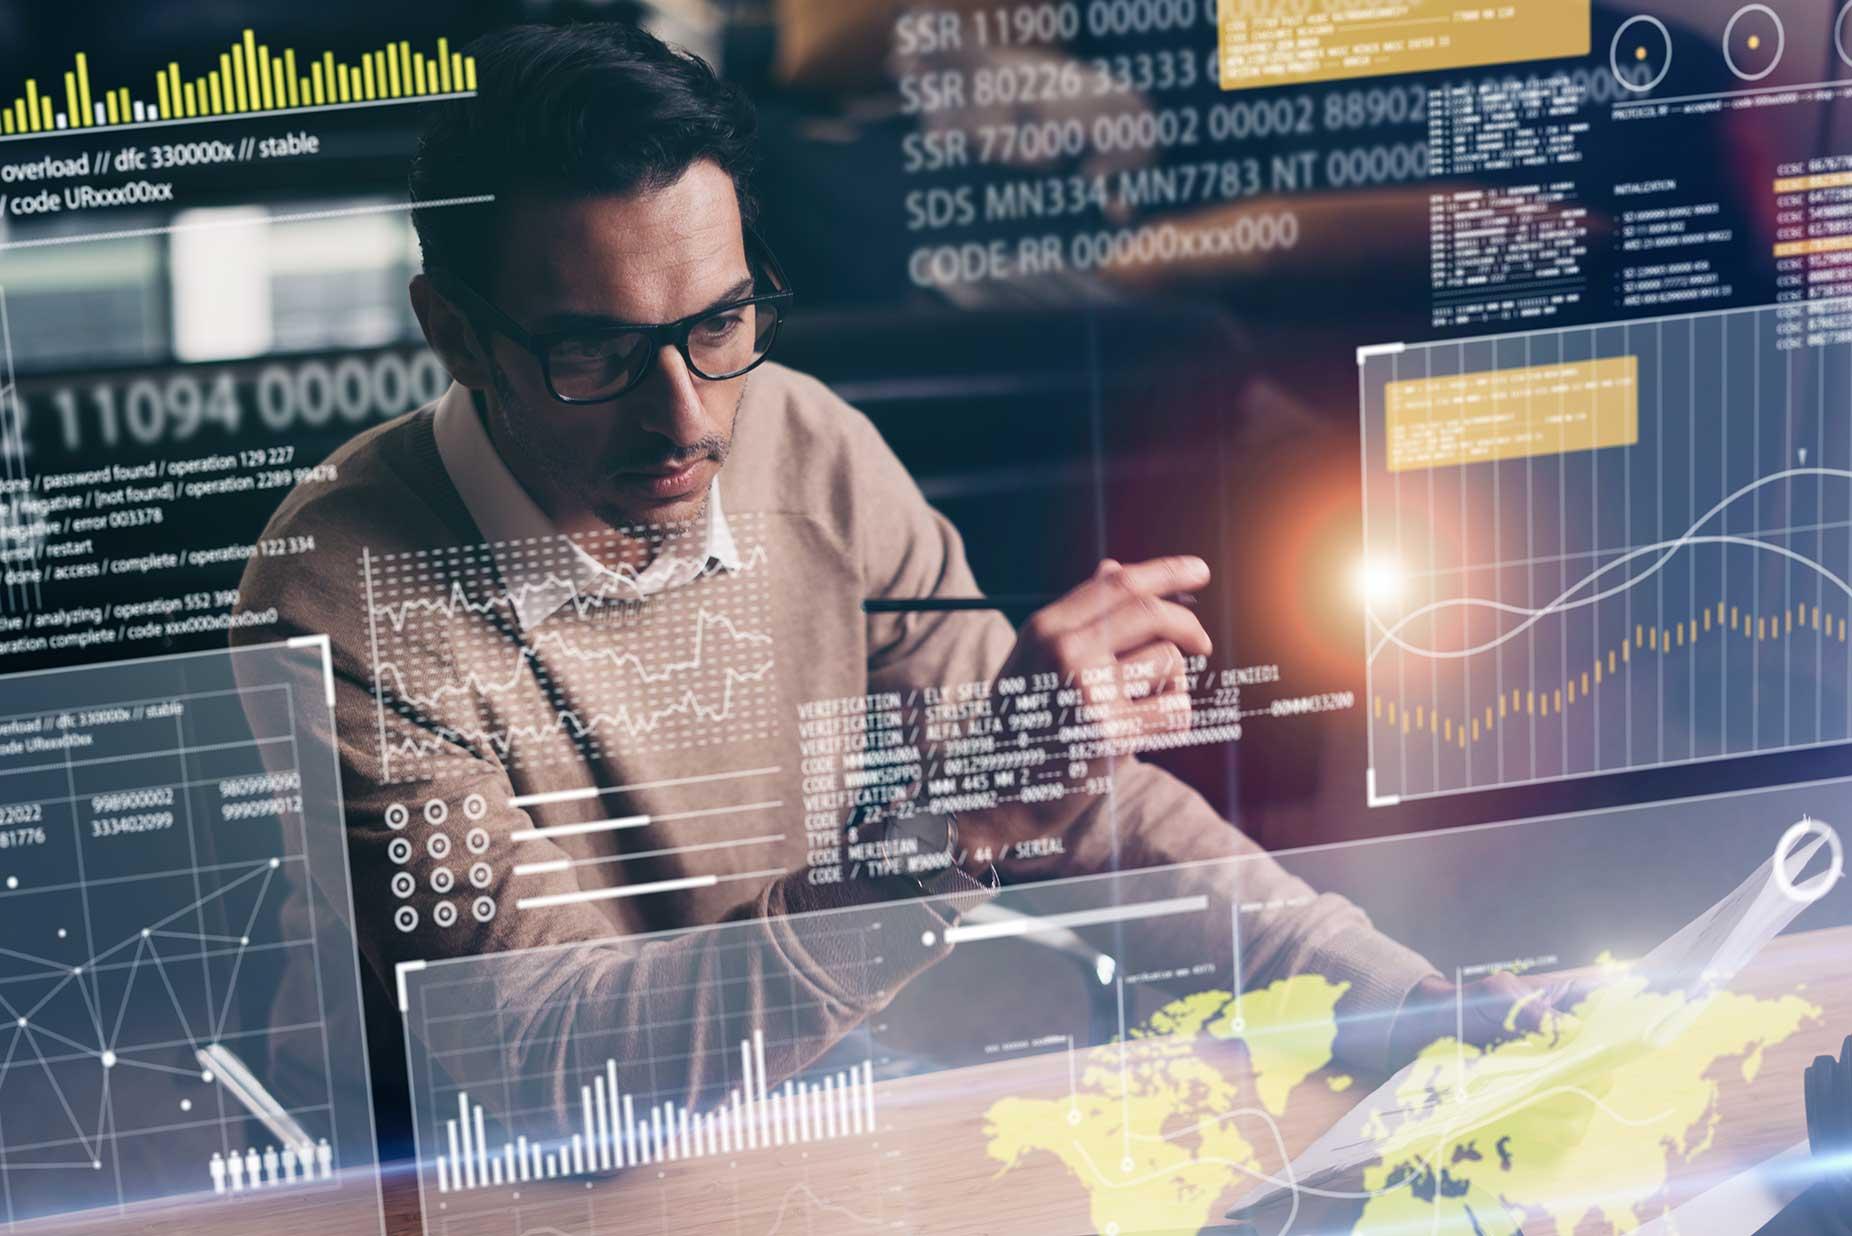 Man analyzing data from high tech monitor